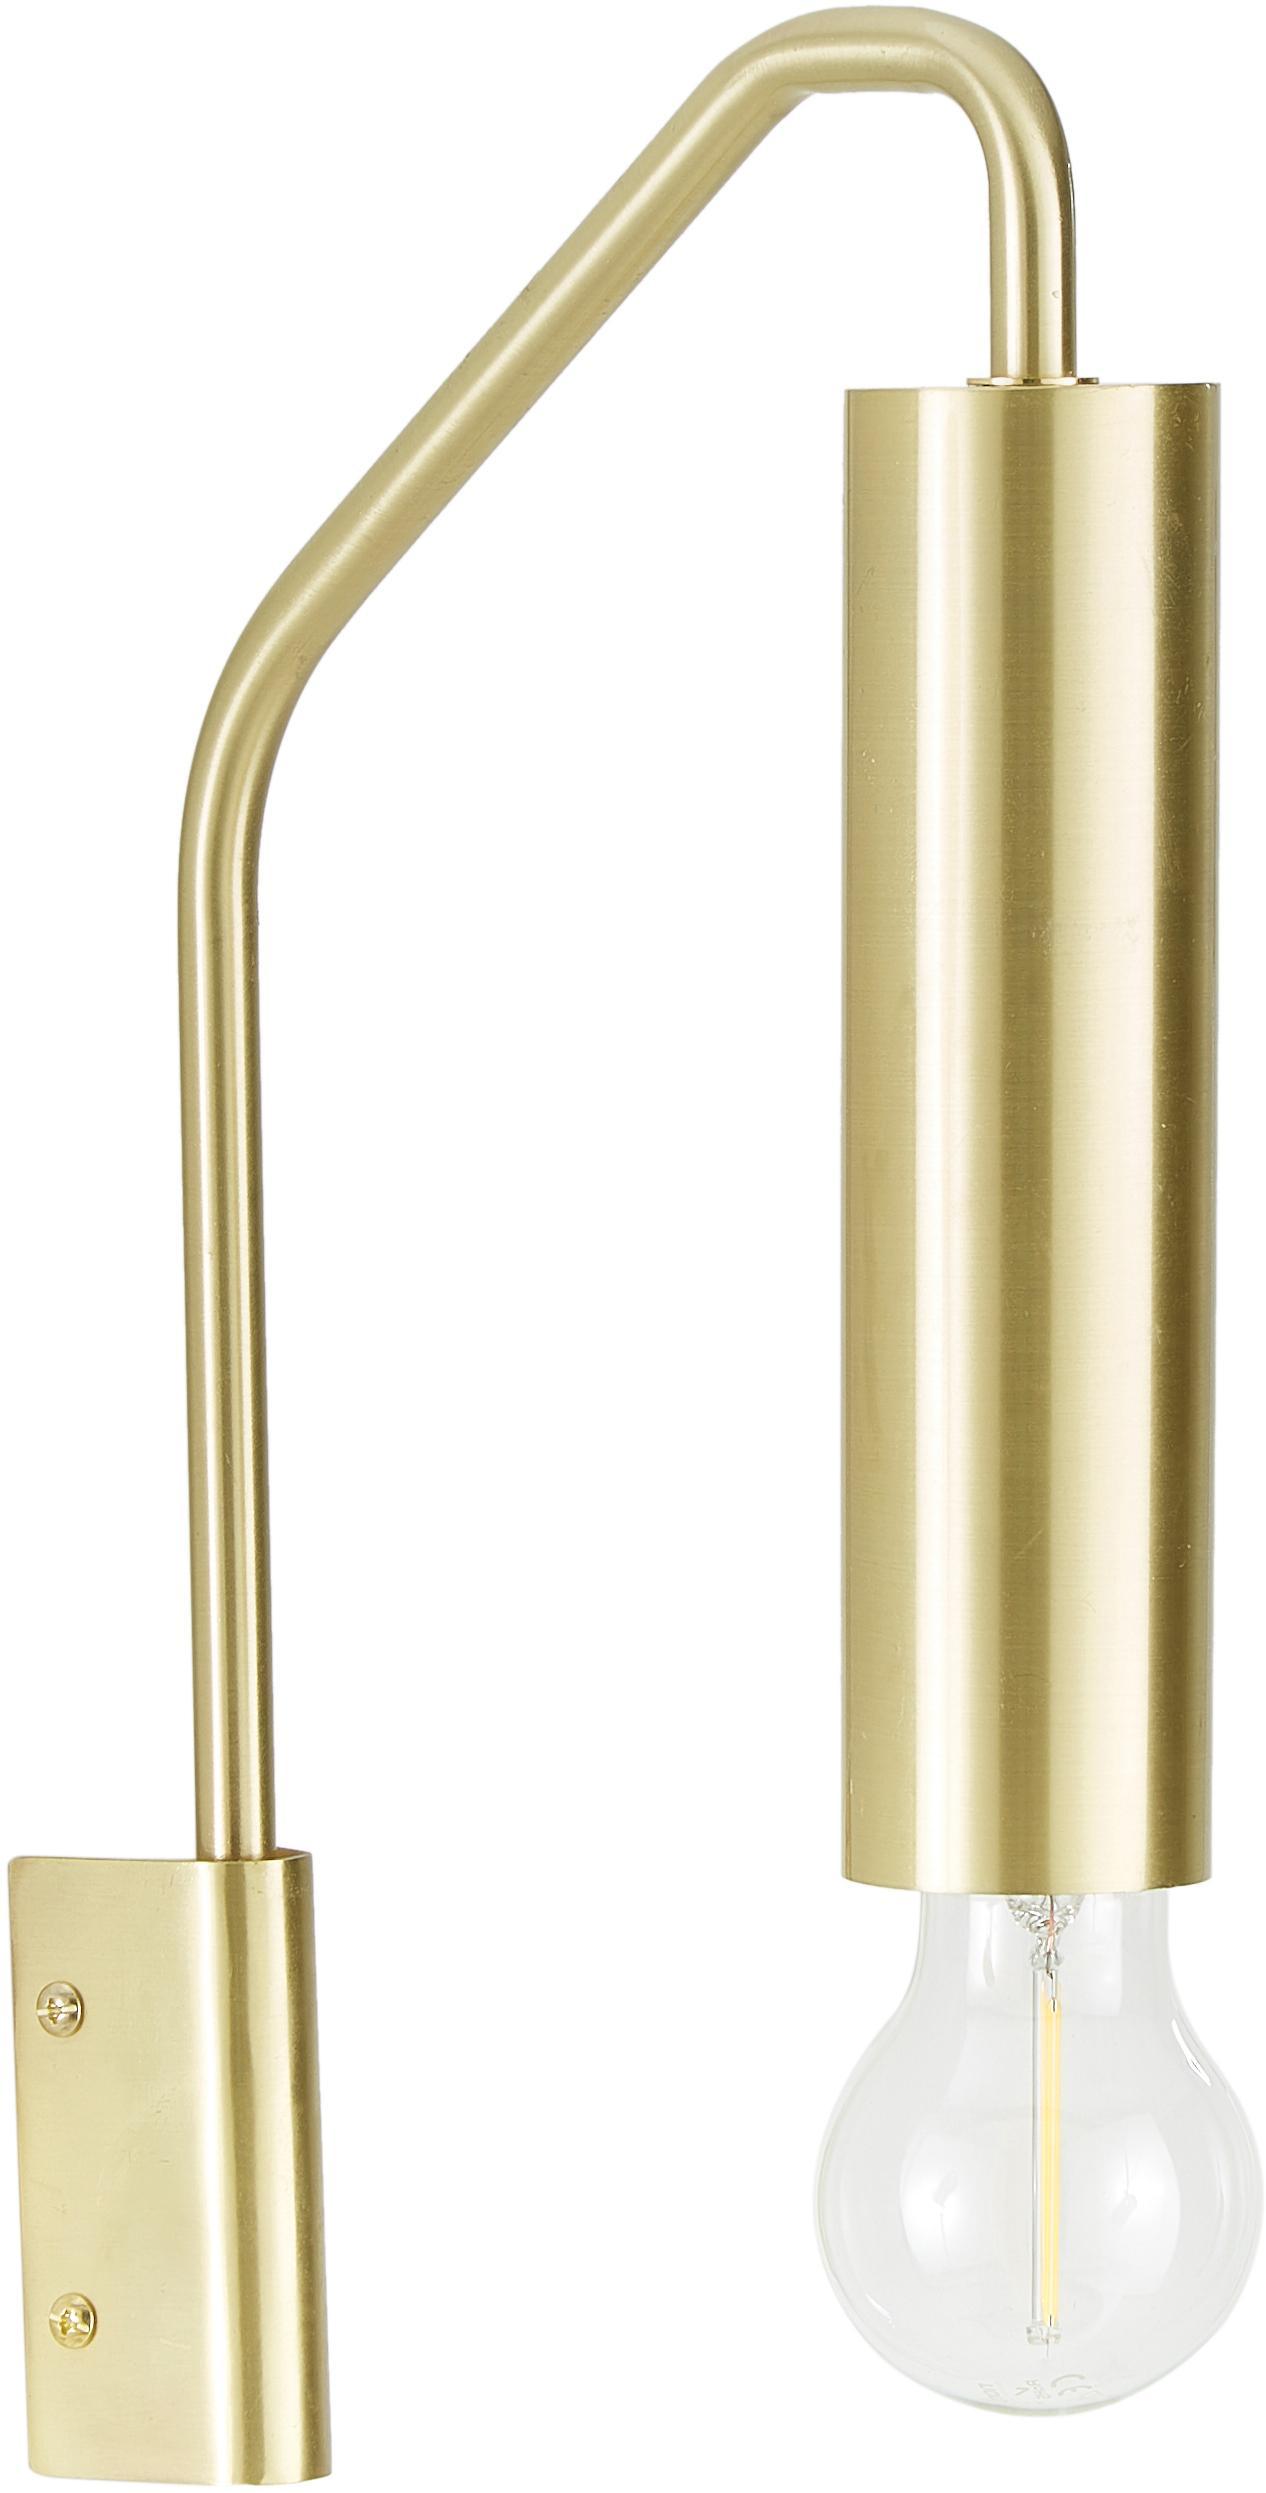 Wandlamp Ida, Geborsteld metaal, Messingkleurig, 5 x 35 cm